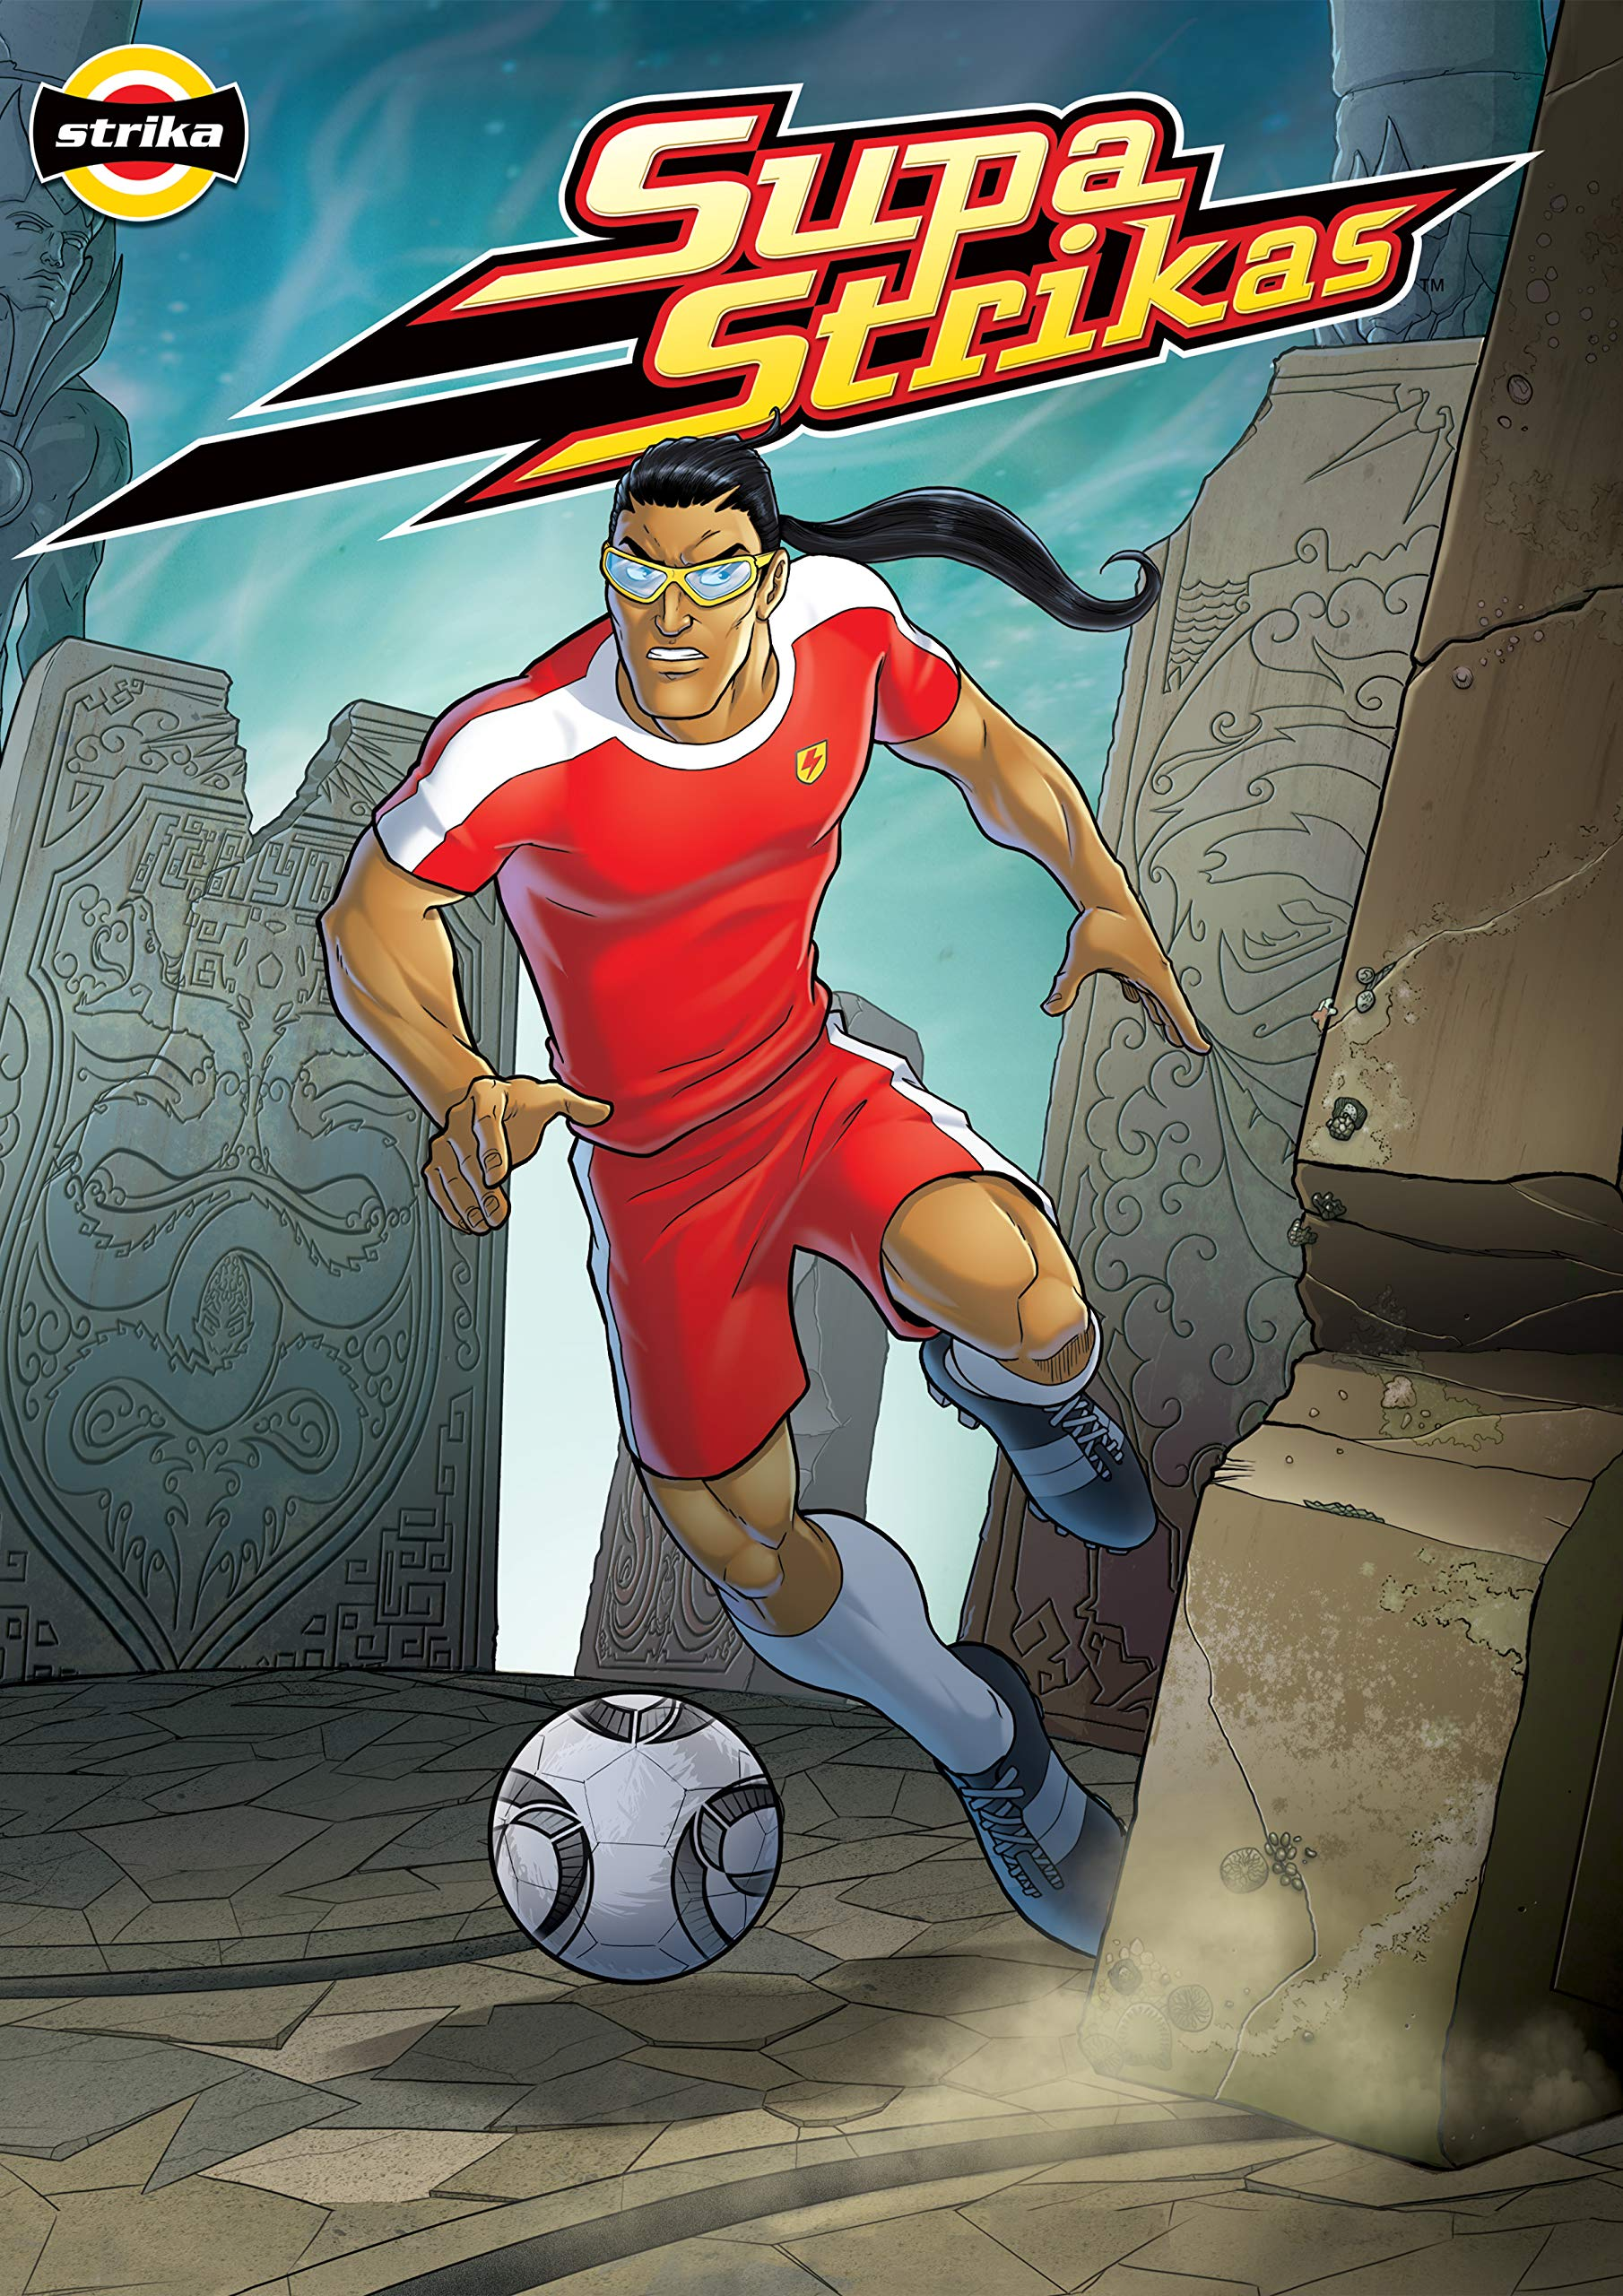 Supa Strikas - Dry Spell : Sports Illustrated Kids Graphic Novels - Comics for Children - Soccer Comics for Kids (Supa Strikas Kick Off Book 2)